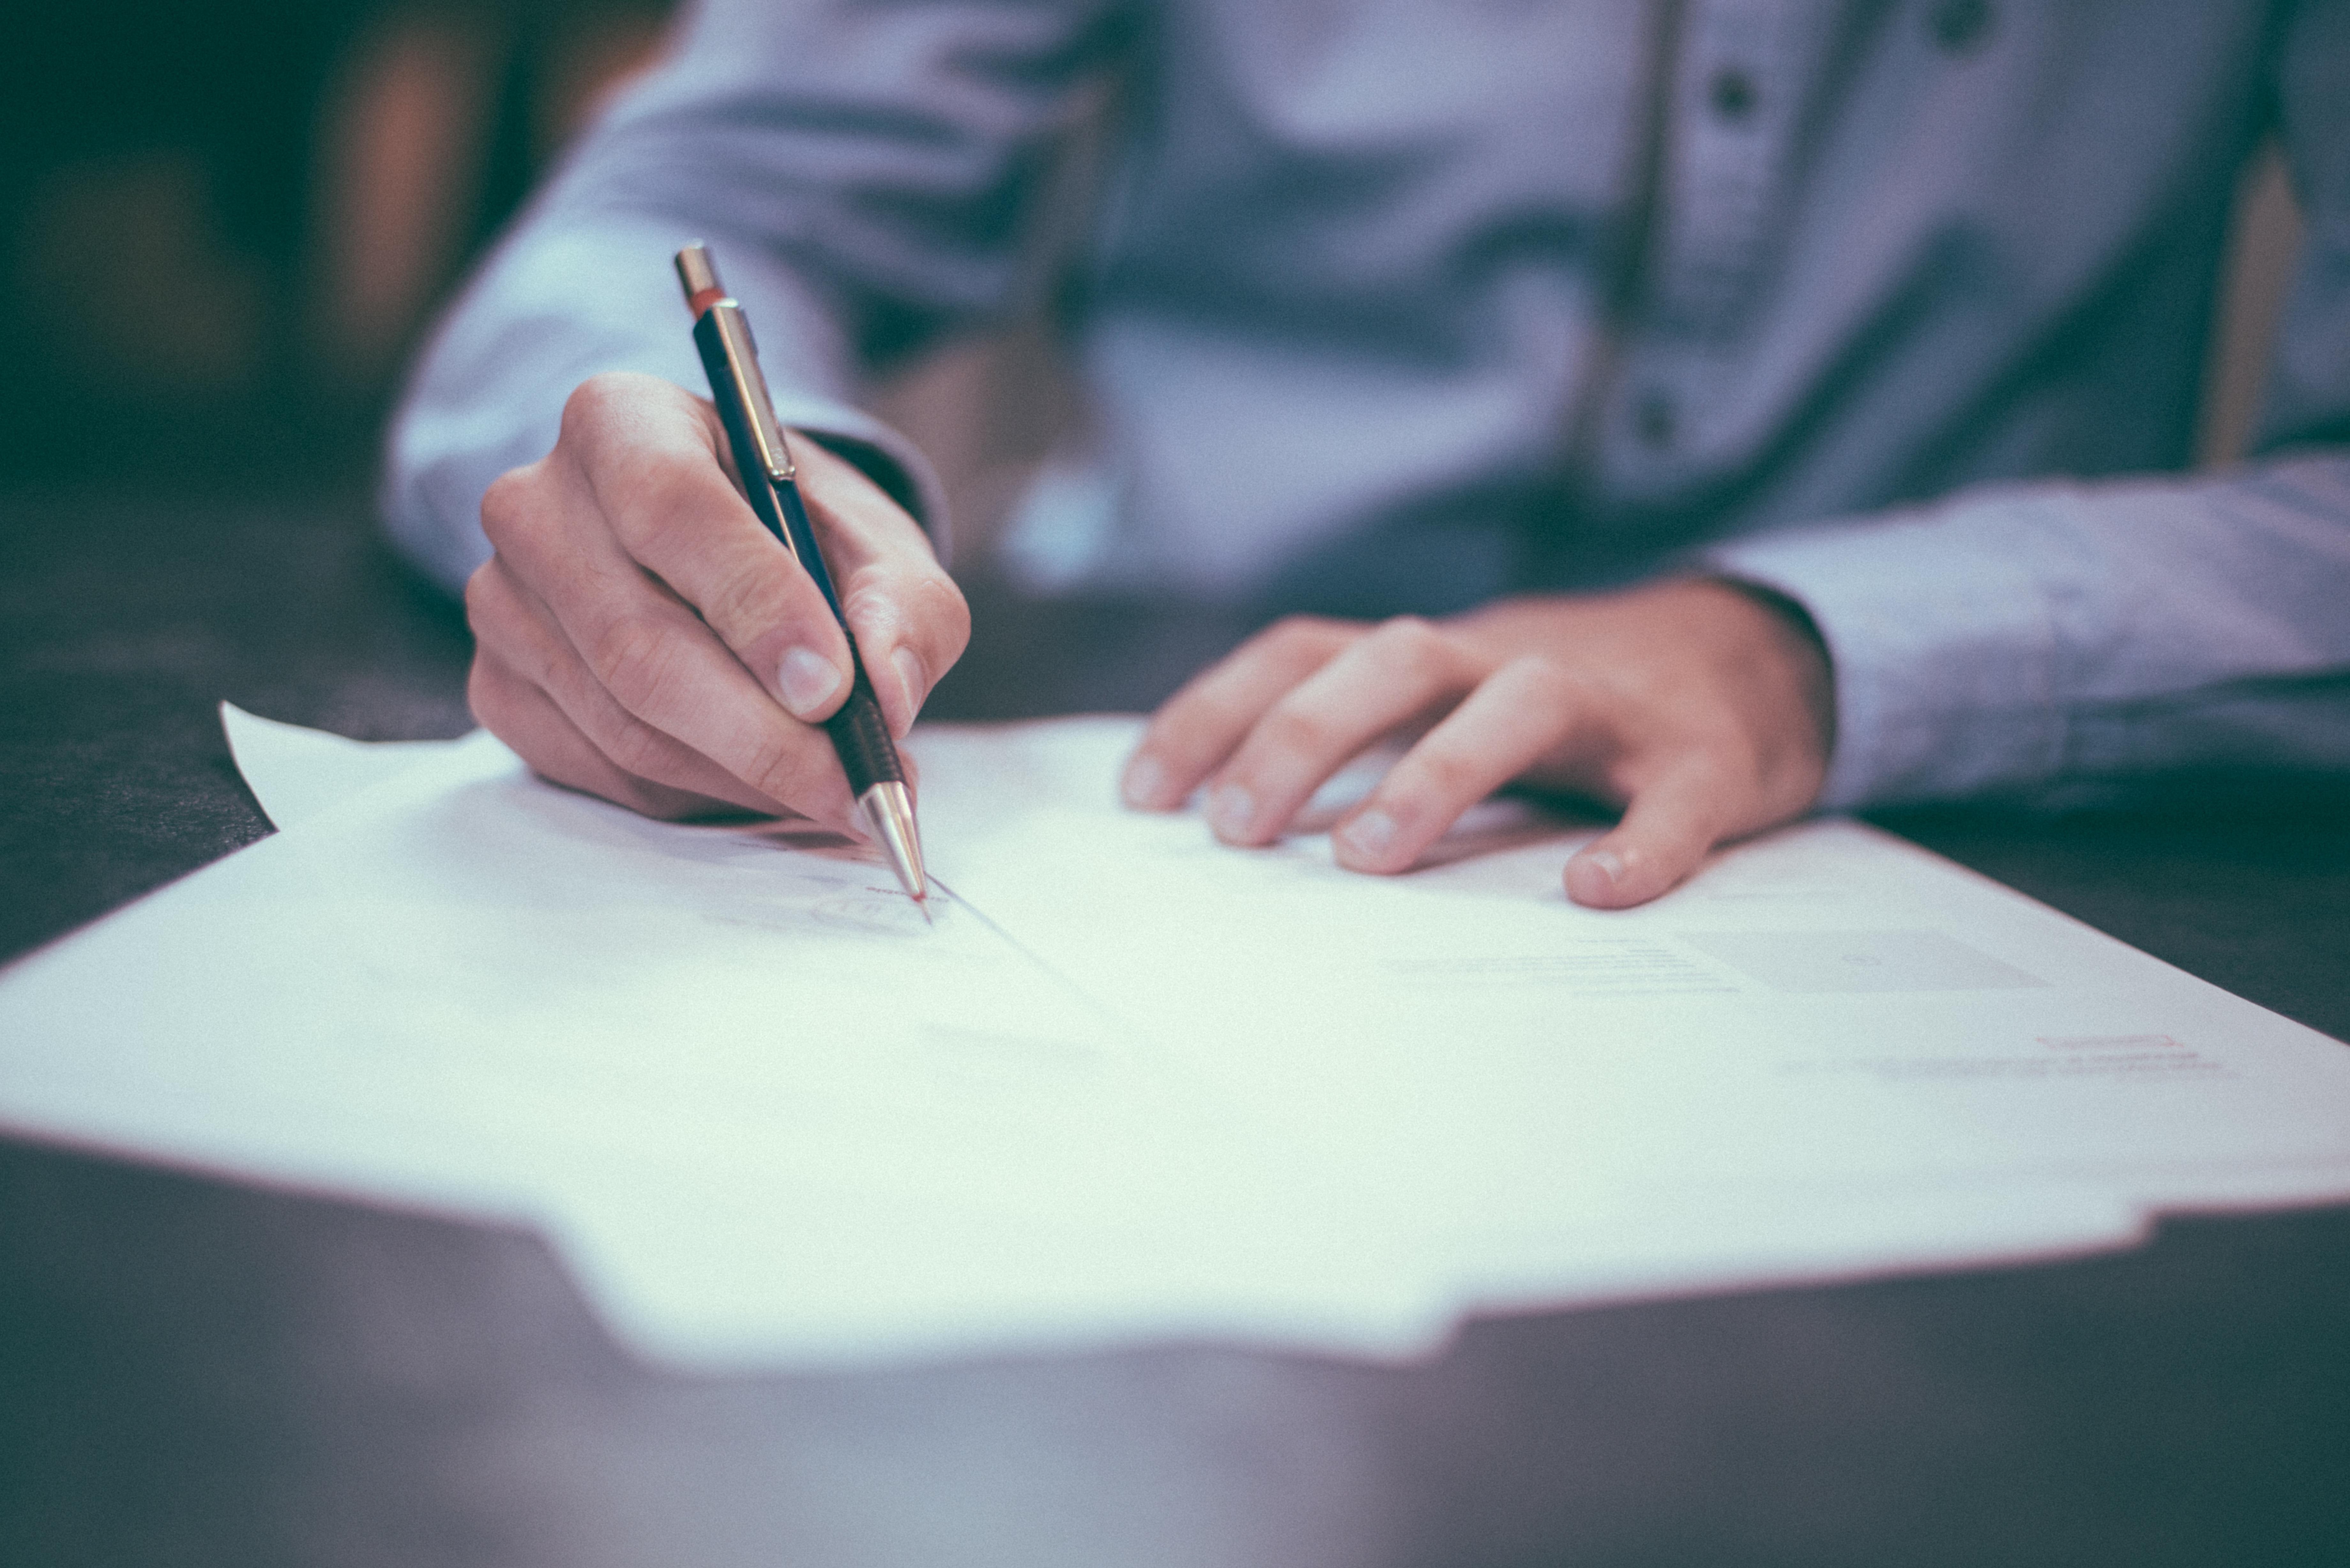 How do lenders assess home loan applications?